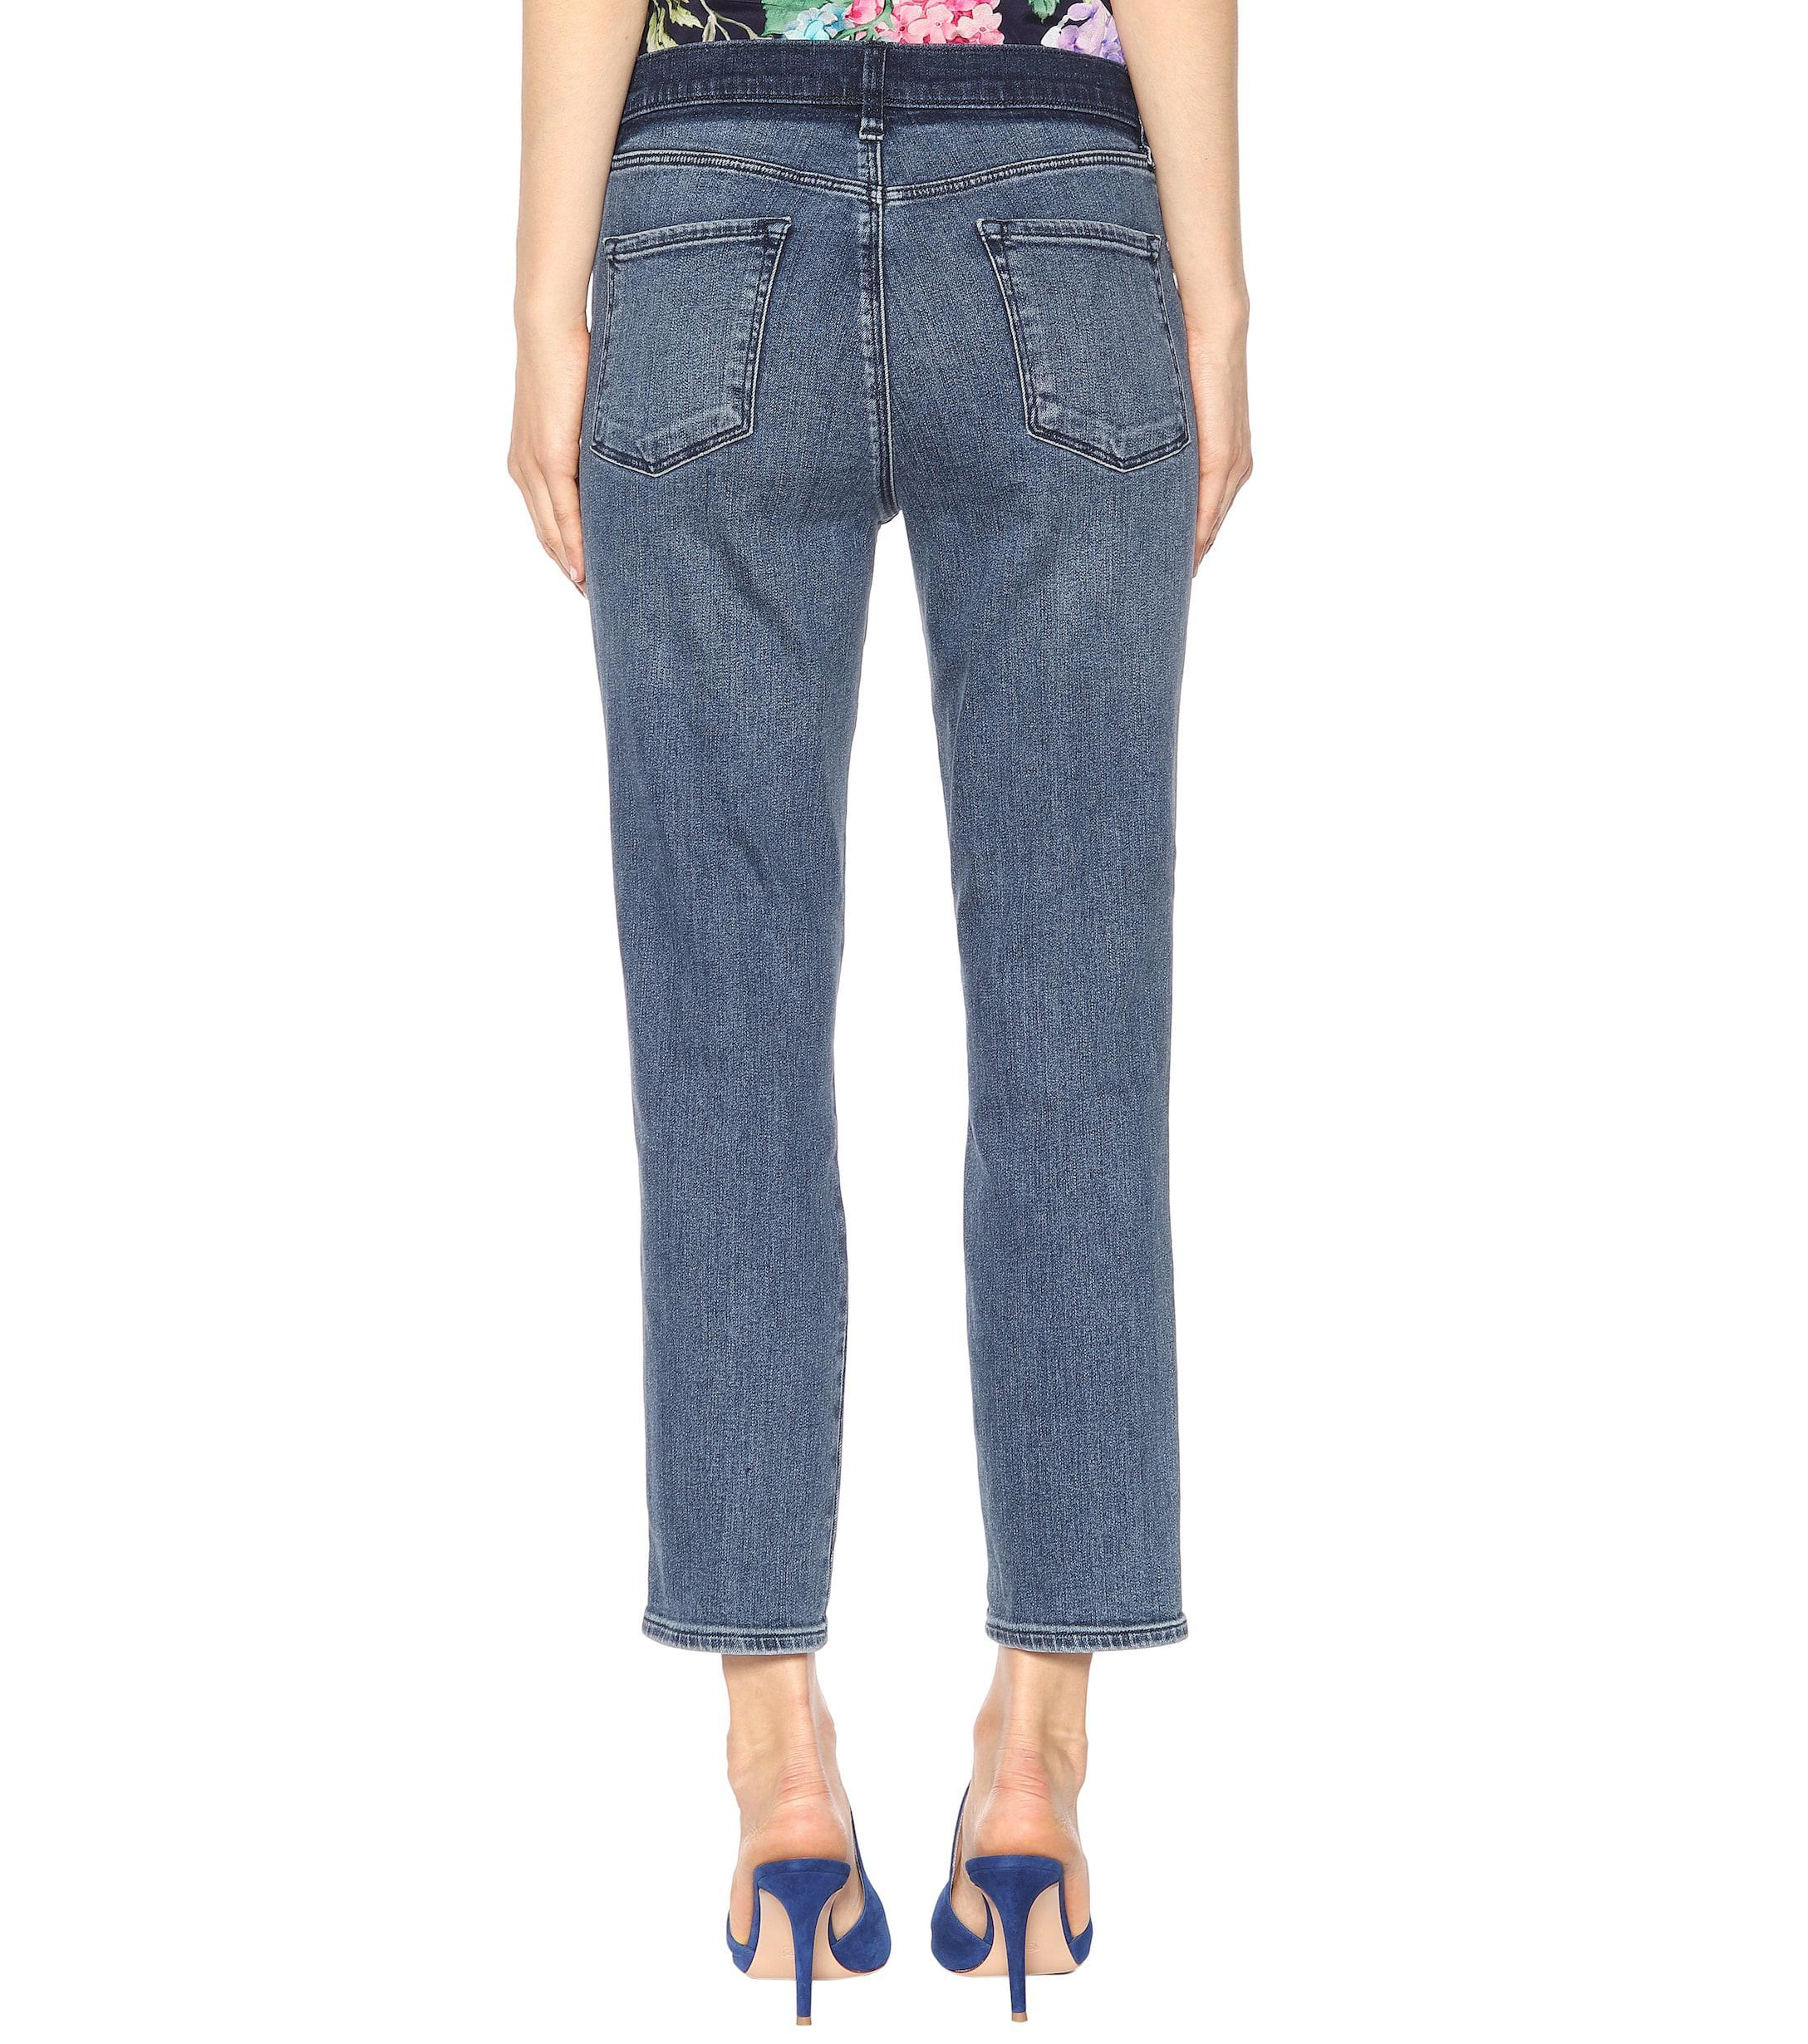 37c347a87a4a J Brand - Blue High Rise Crop Ruby Jeans - Lyst. View fullscreen